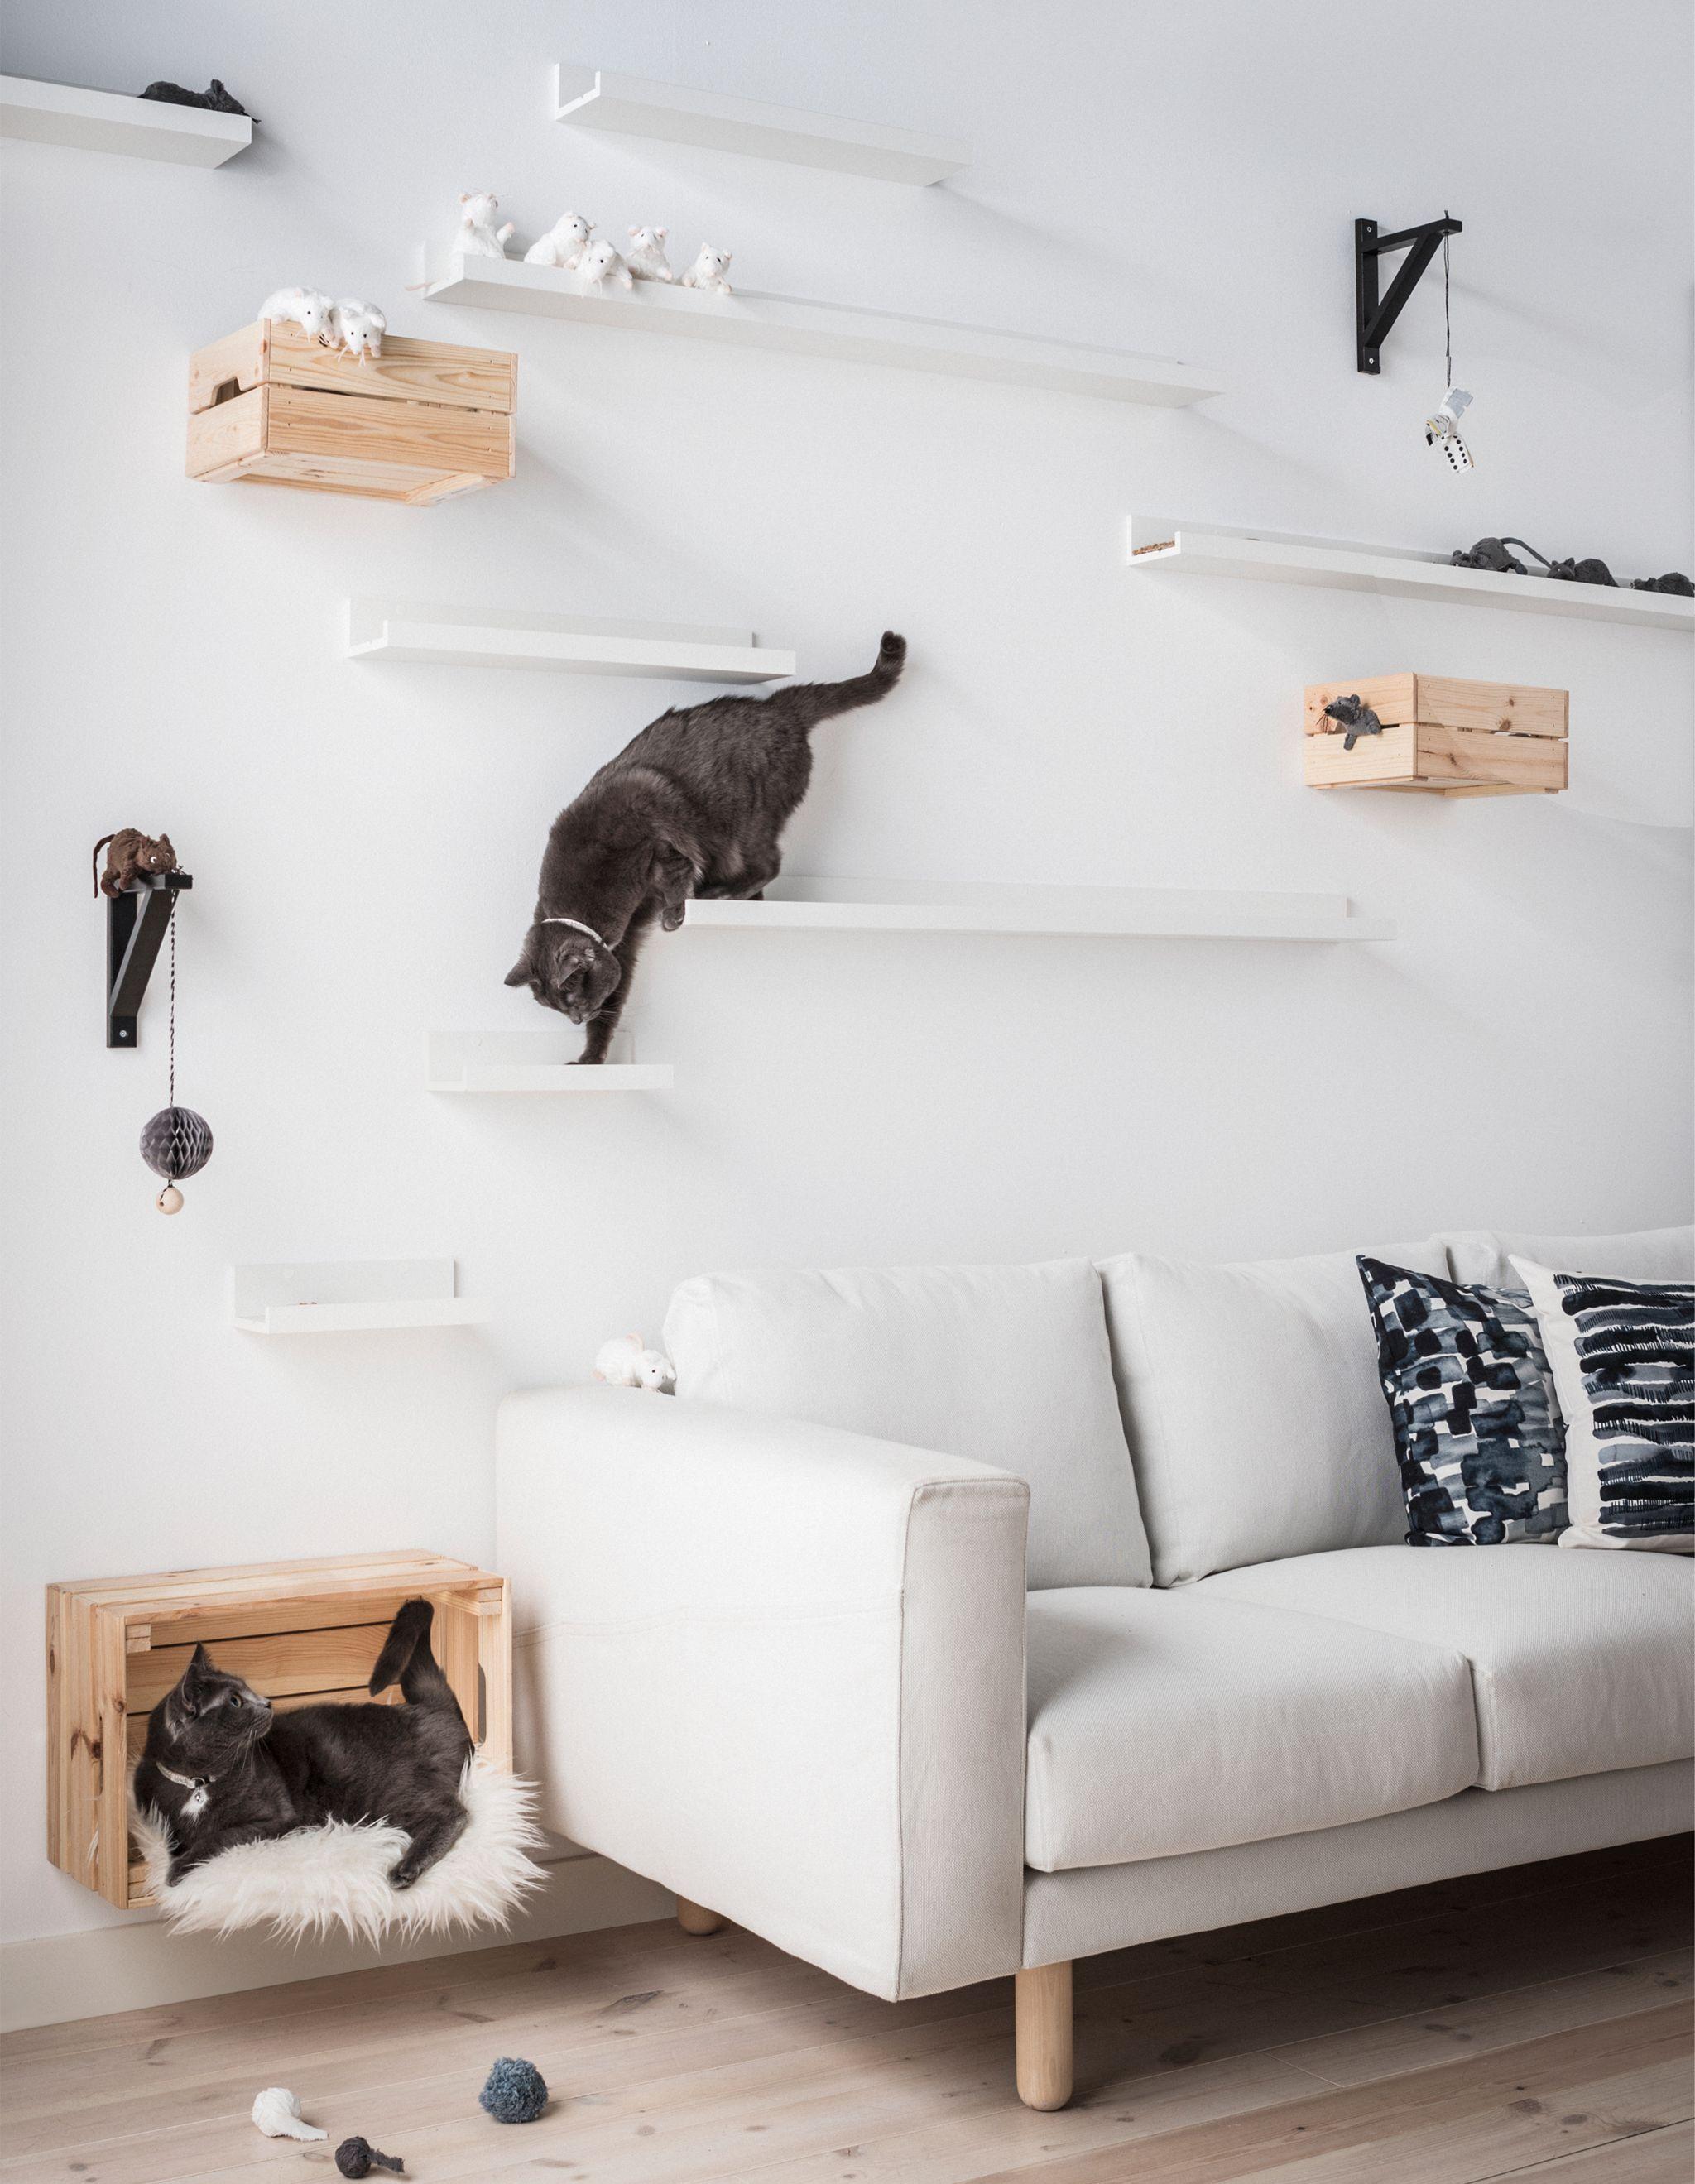 Ikea Picture Ledge Hacks Diy cat shelves, Cat climbing